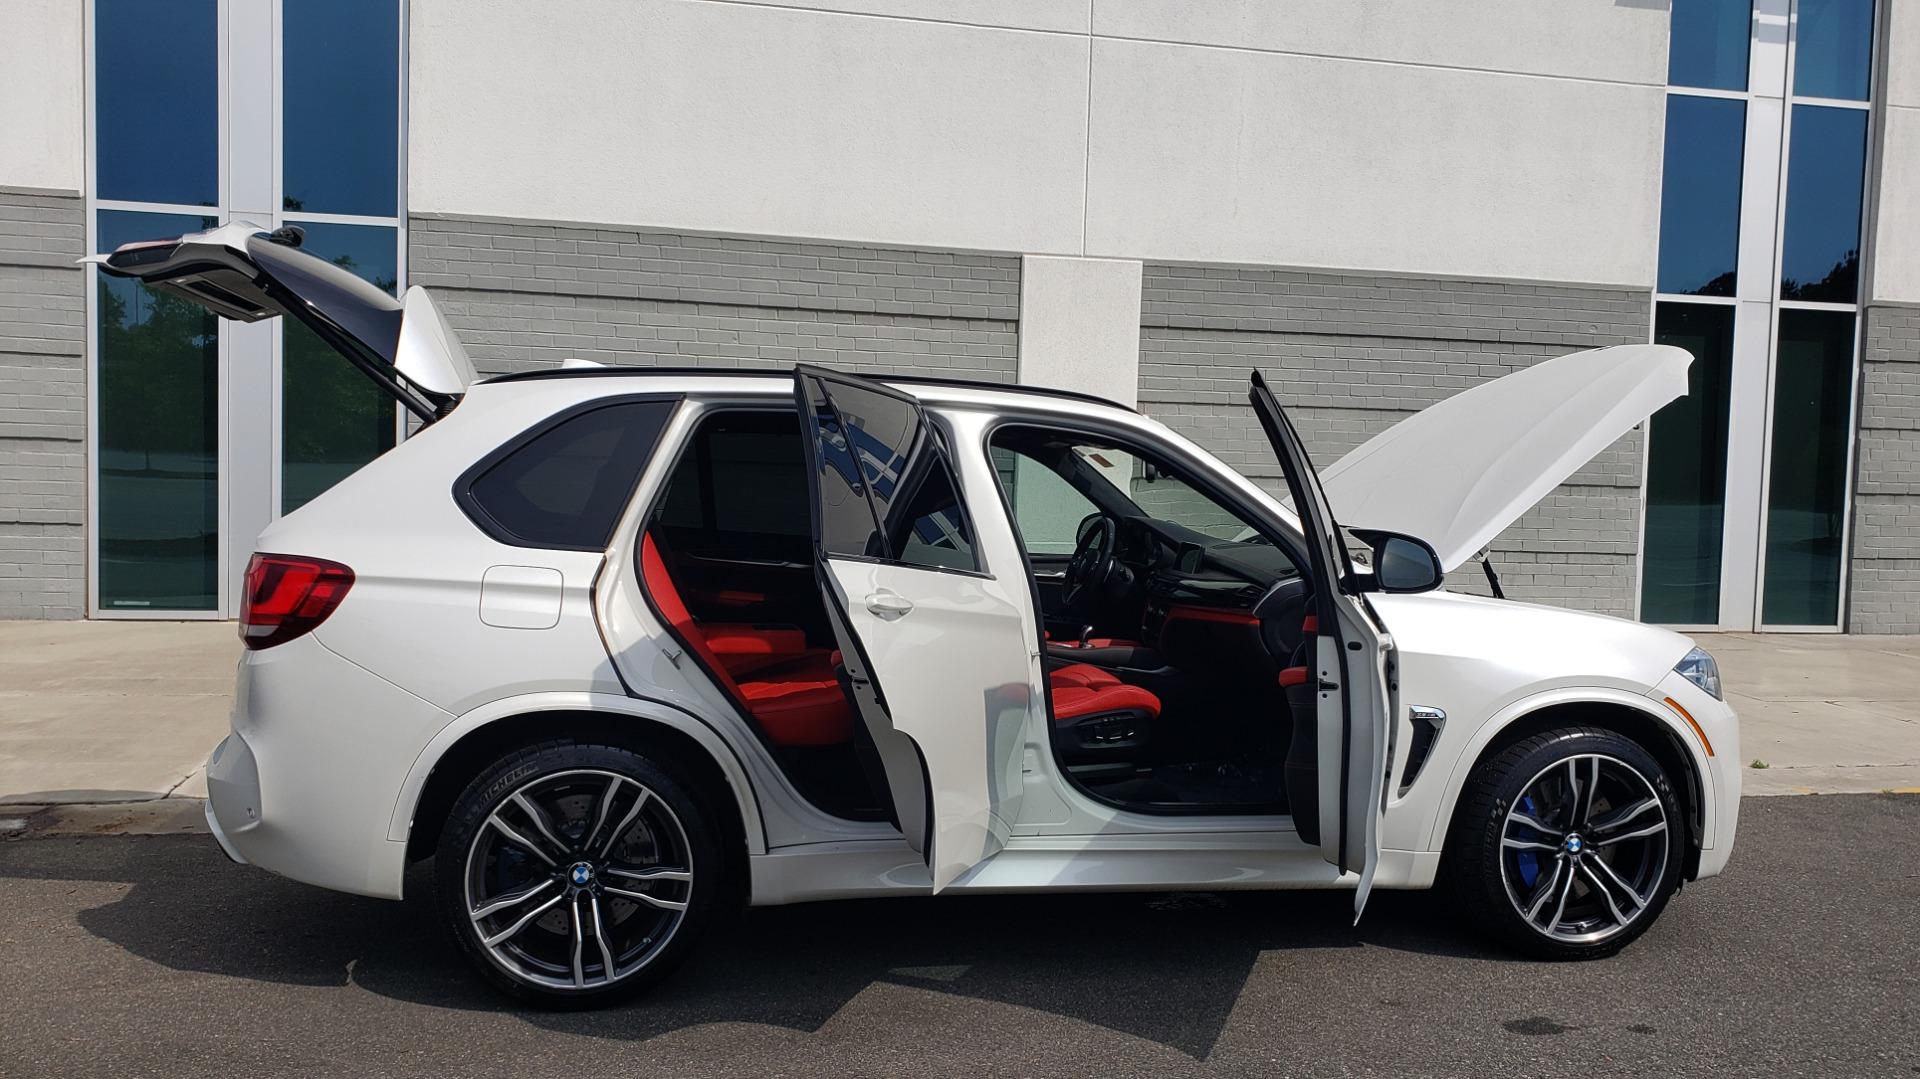 Used 2017 BMW X5 M EXECUTIVE PKG / NAV / DRVR ASST / BSM / HUD / HTD STS / WIFI for sale Sold at Formula Imports in Charlotte NC 28227 12